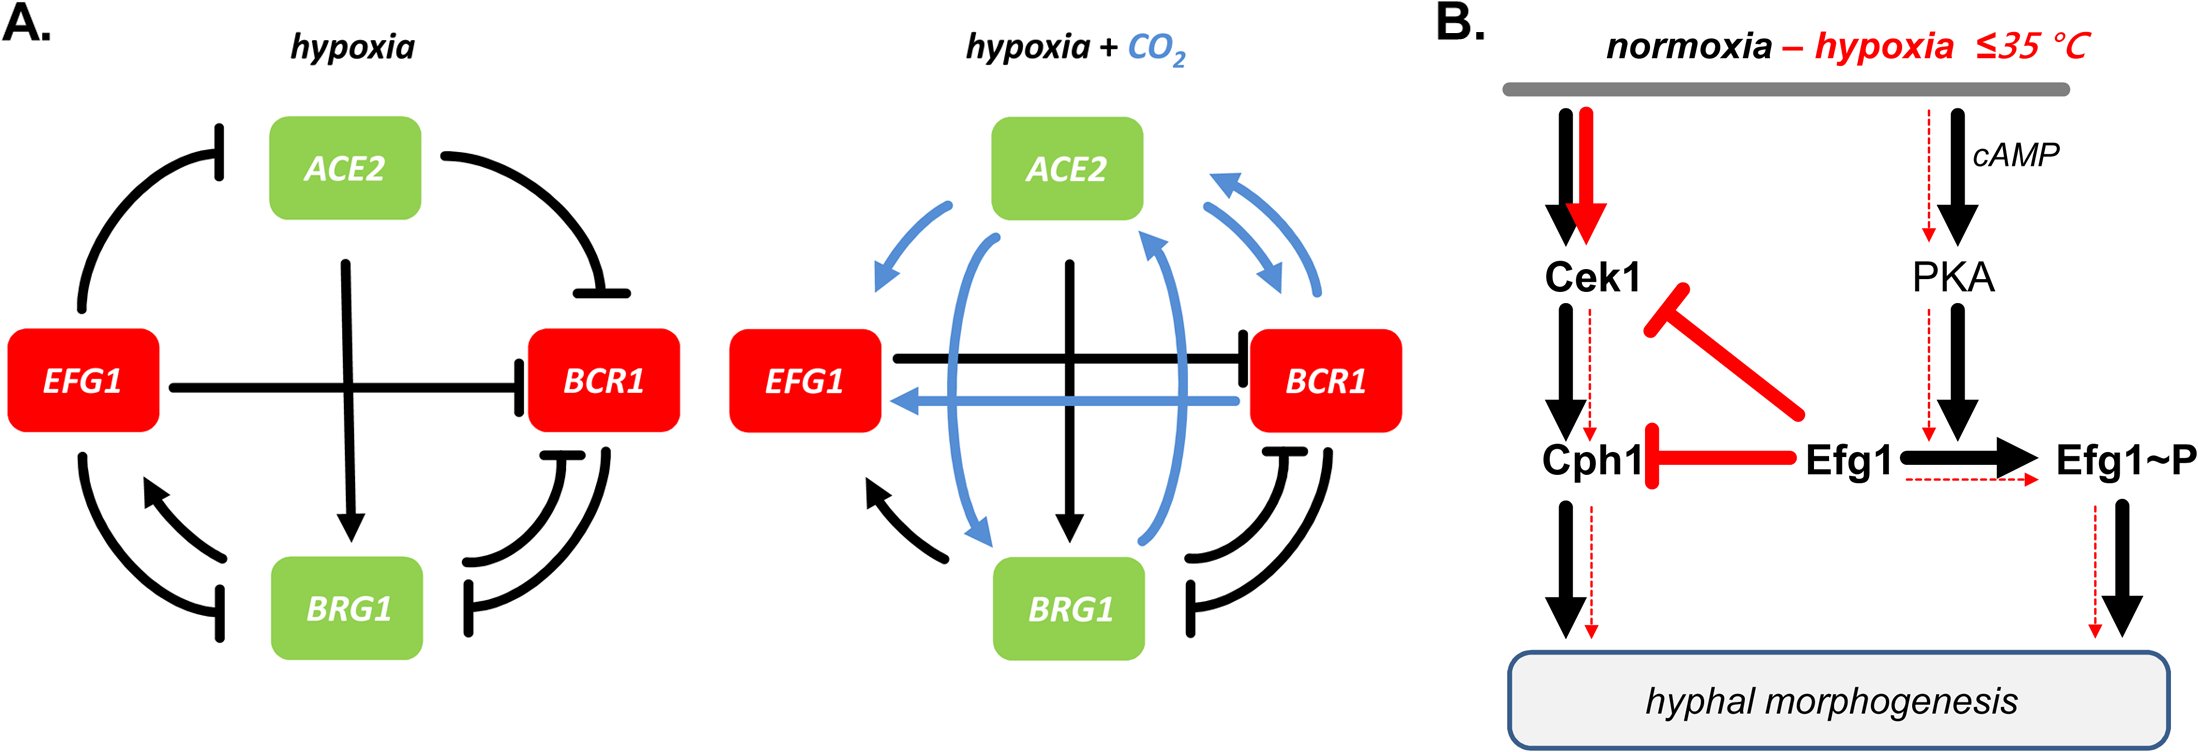 Models for transcriptional regulation and morphogenesis under hypoxia.